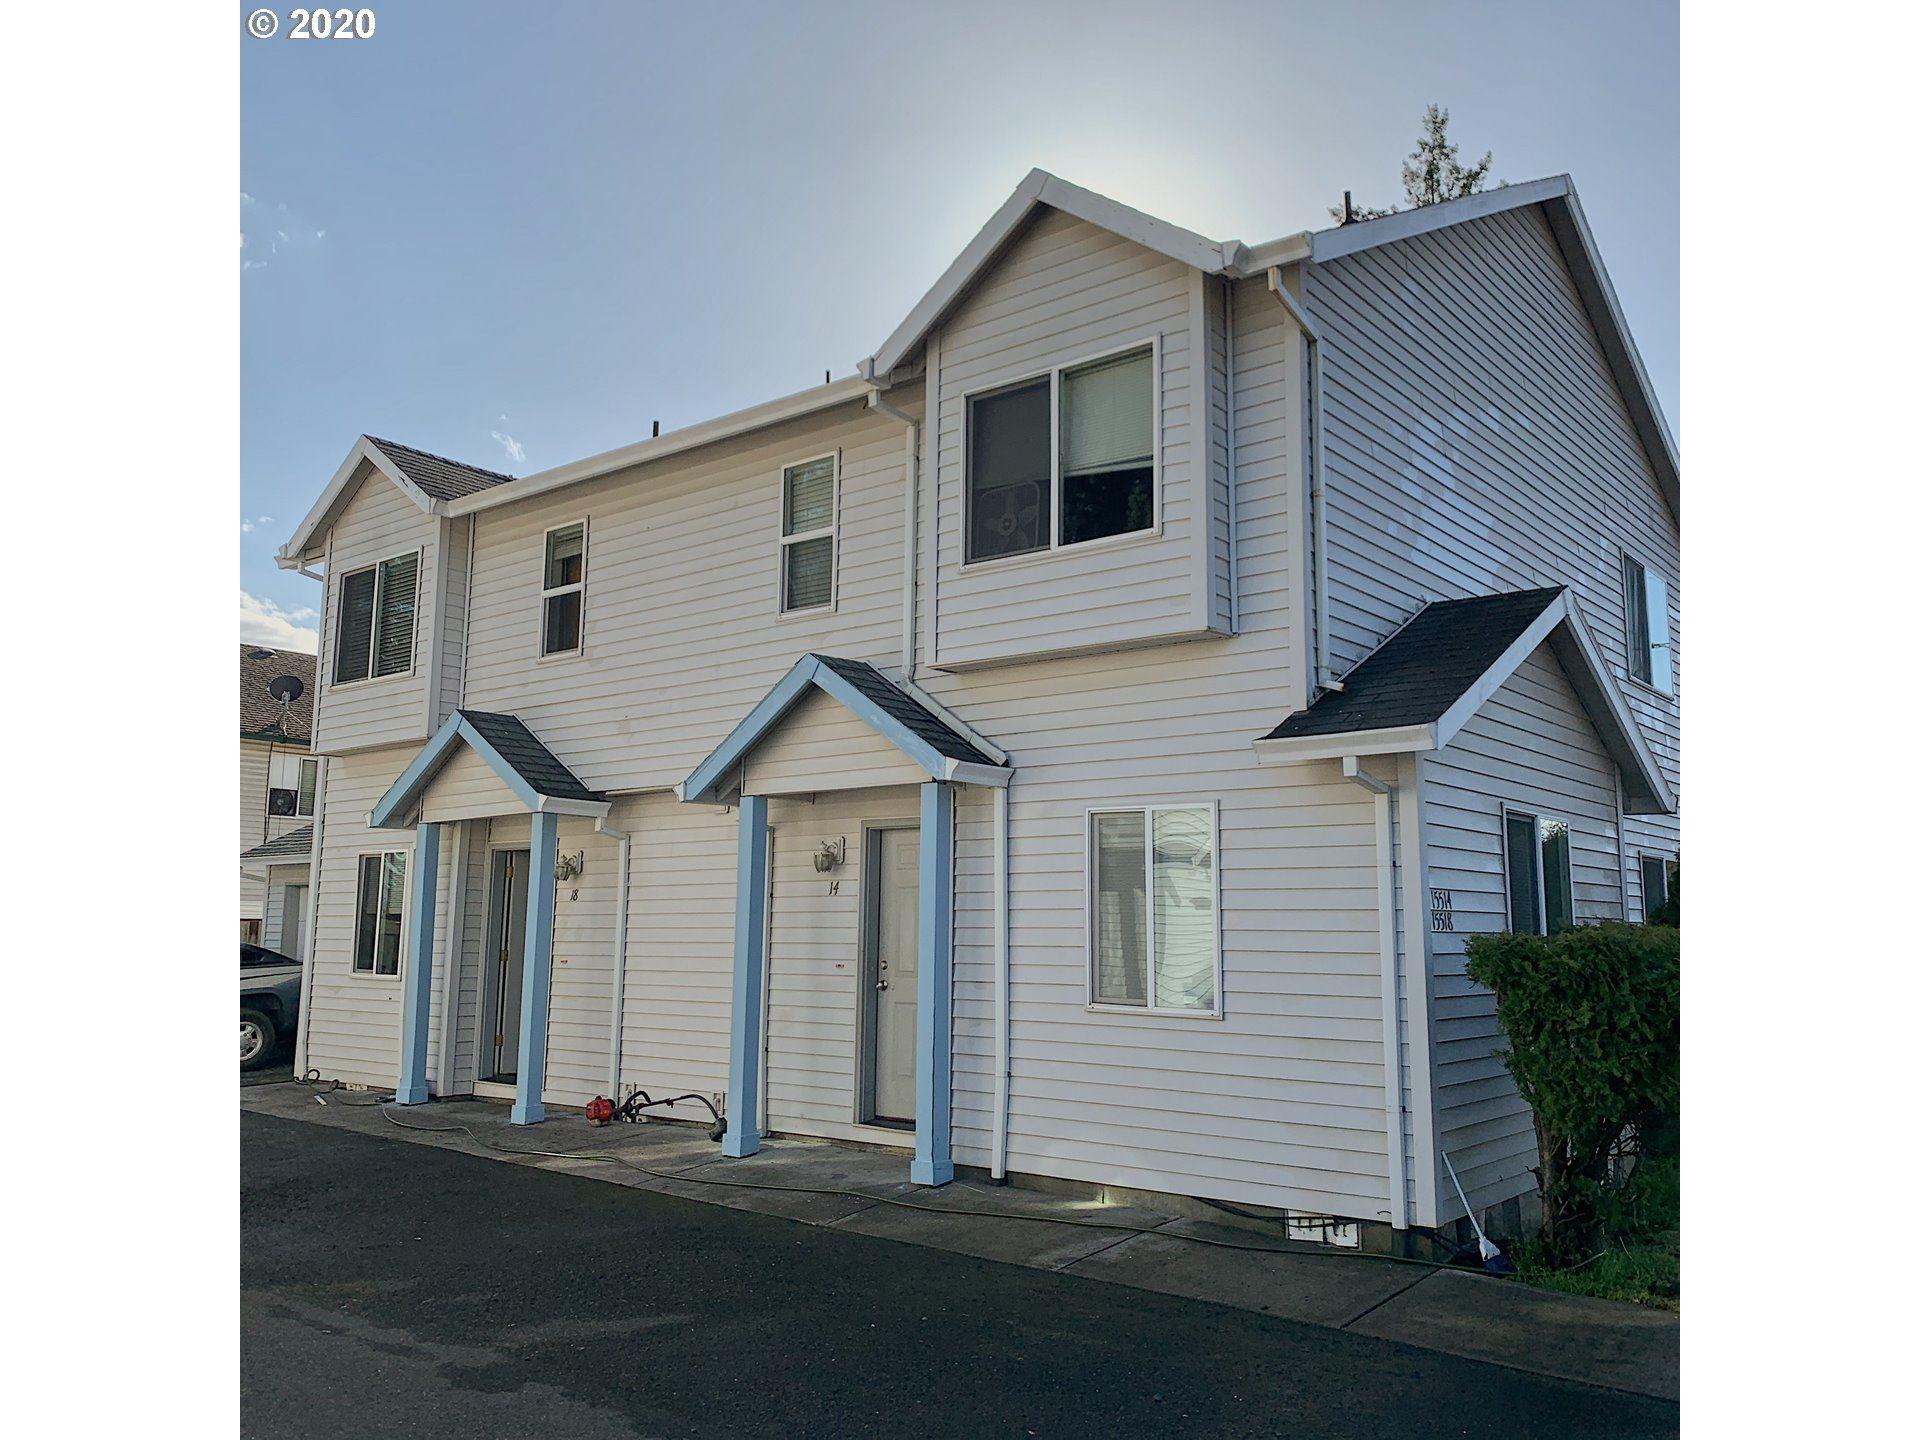 15514 SE STARK ST, Portland, OR 97233 - MLS#: 20679681